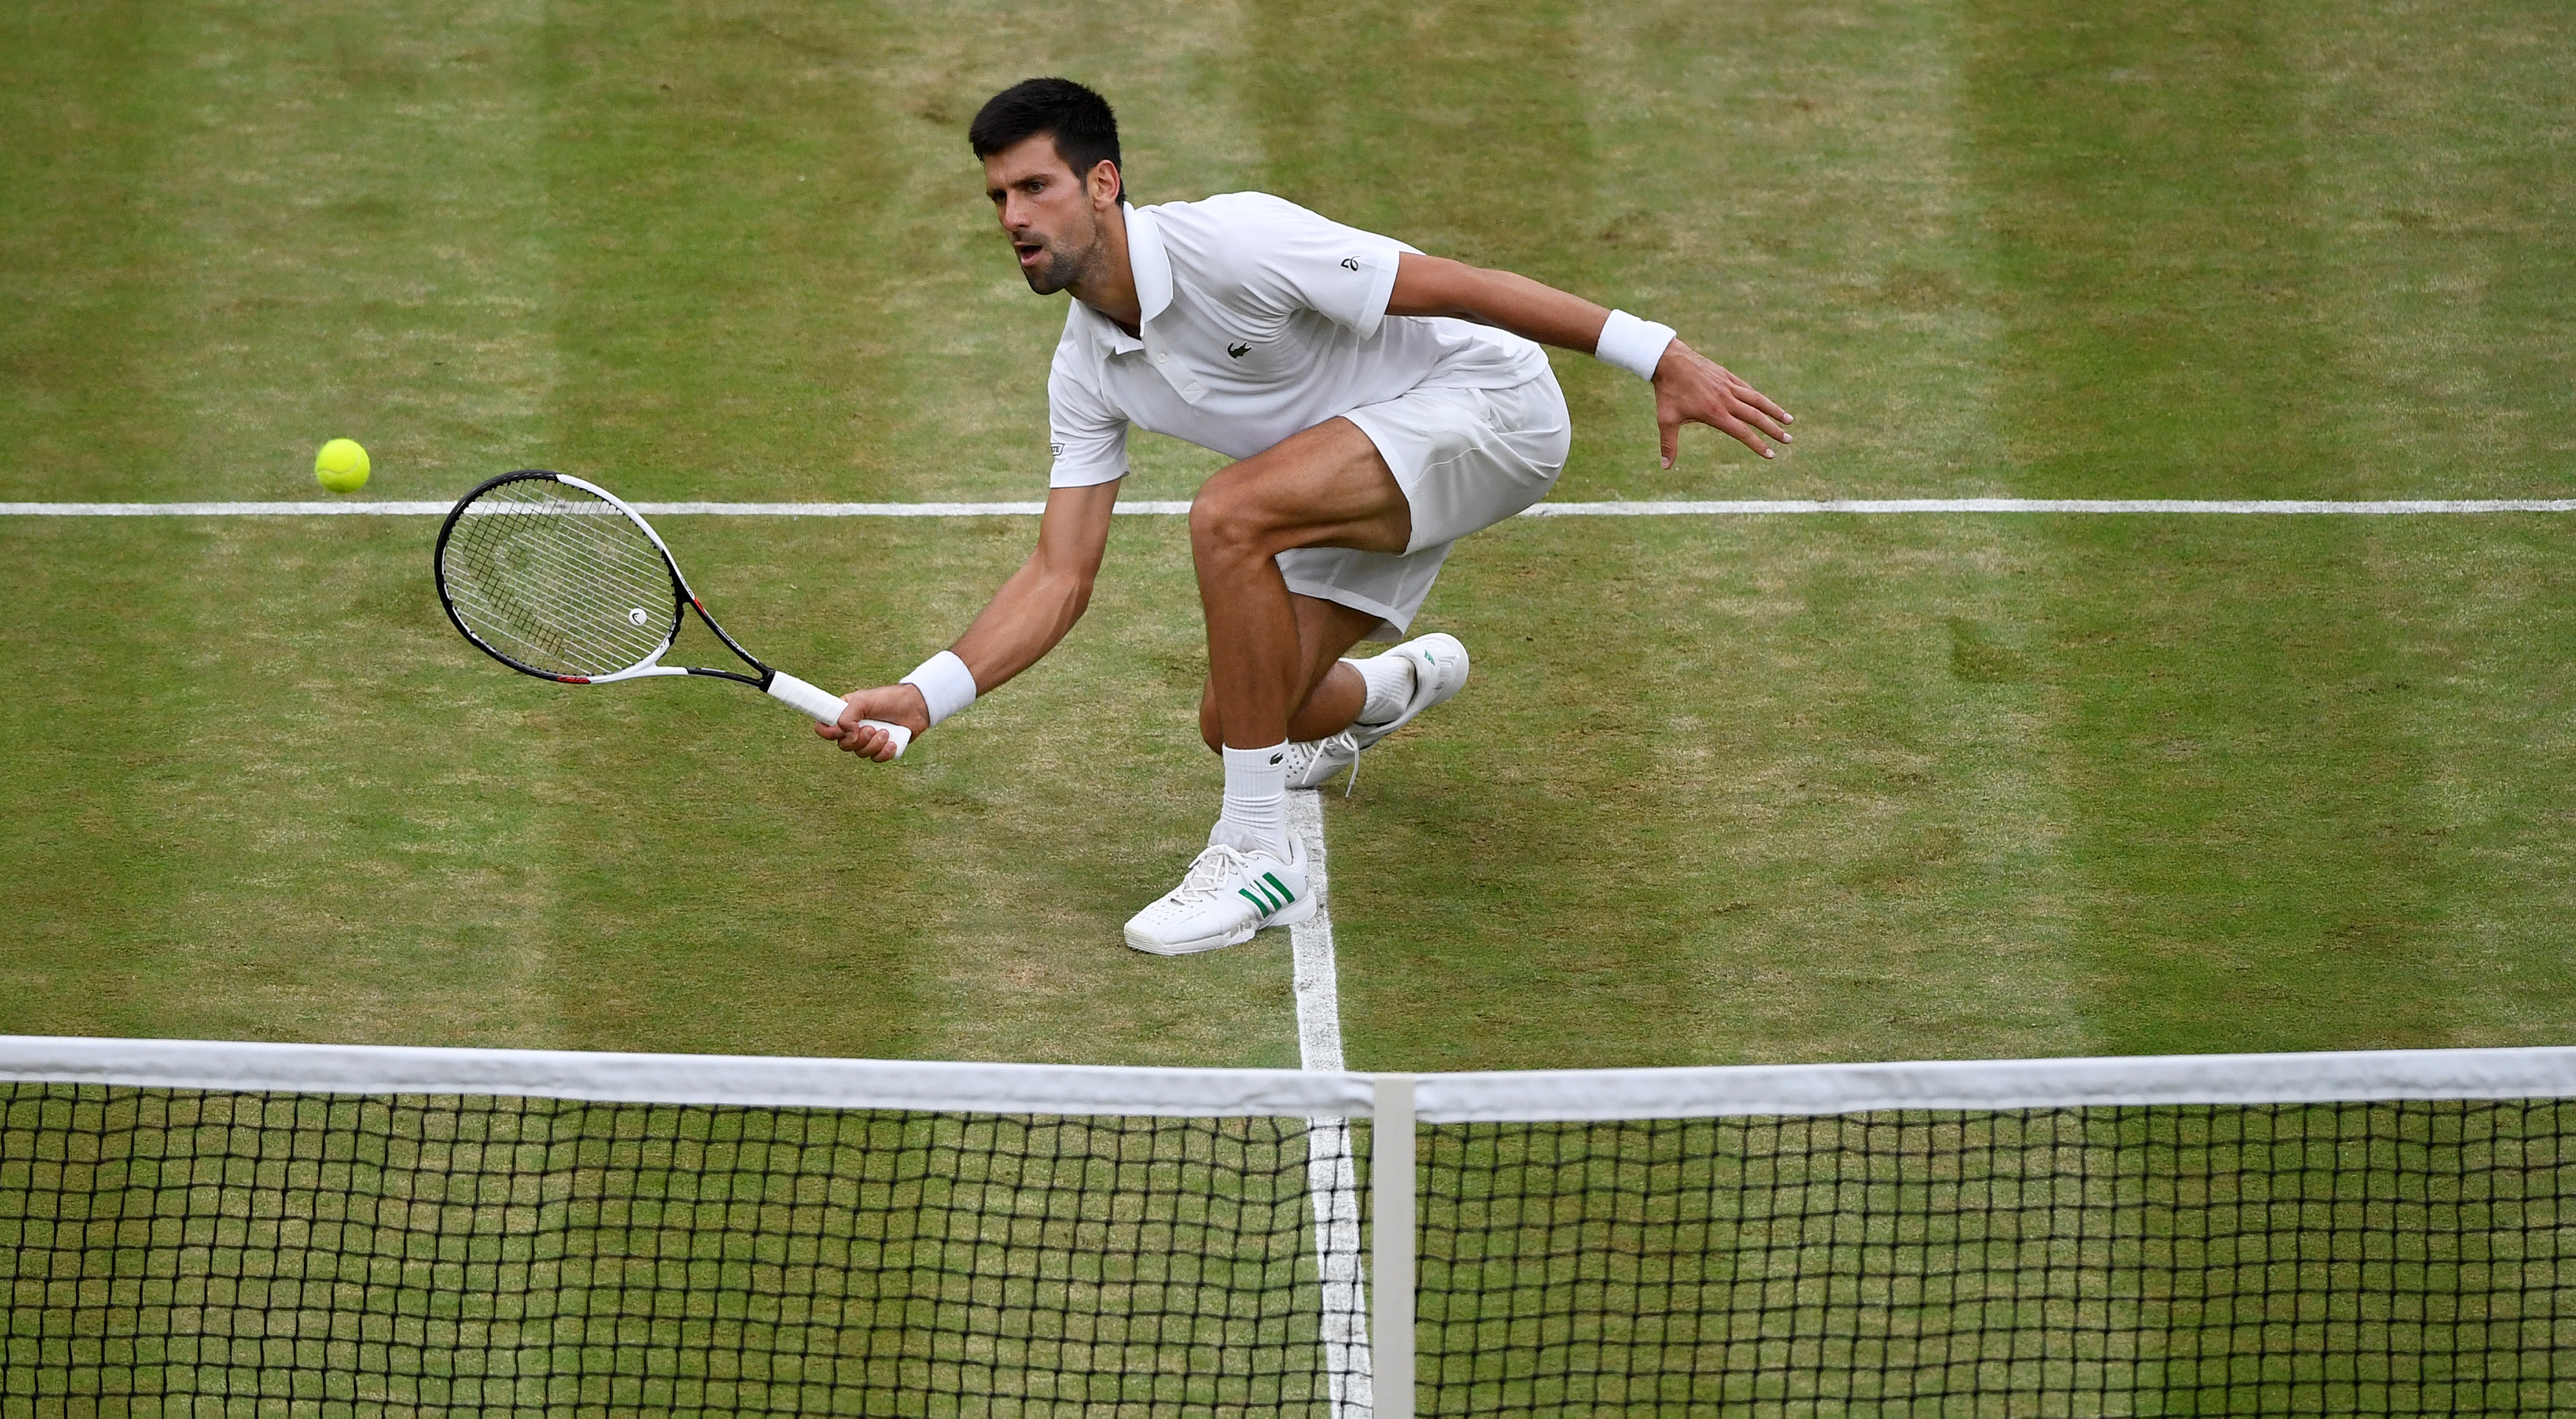 Tennis: Djokovic complains of 'hole' on Wimbledon Centre Court